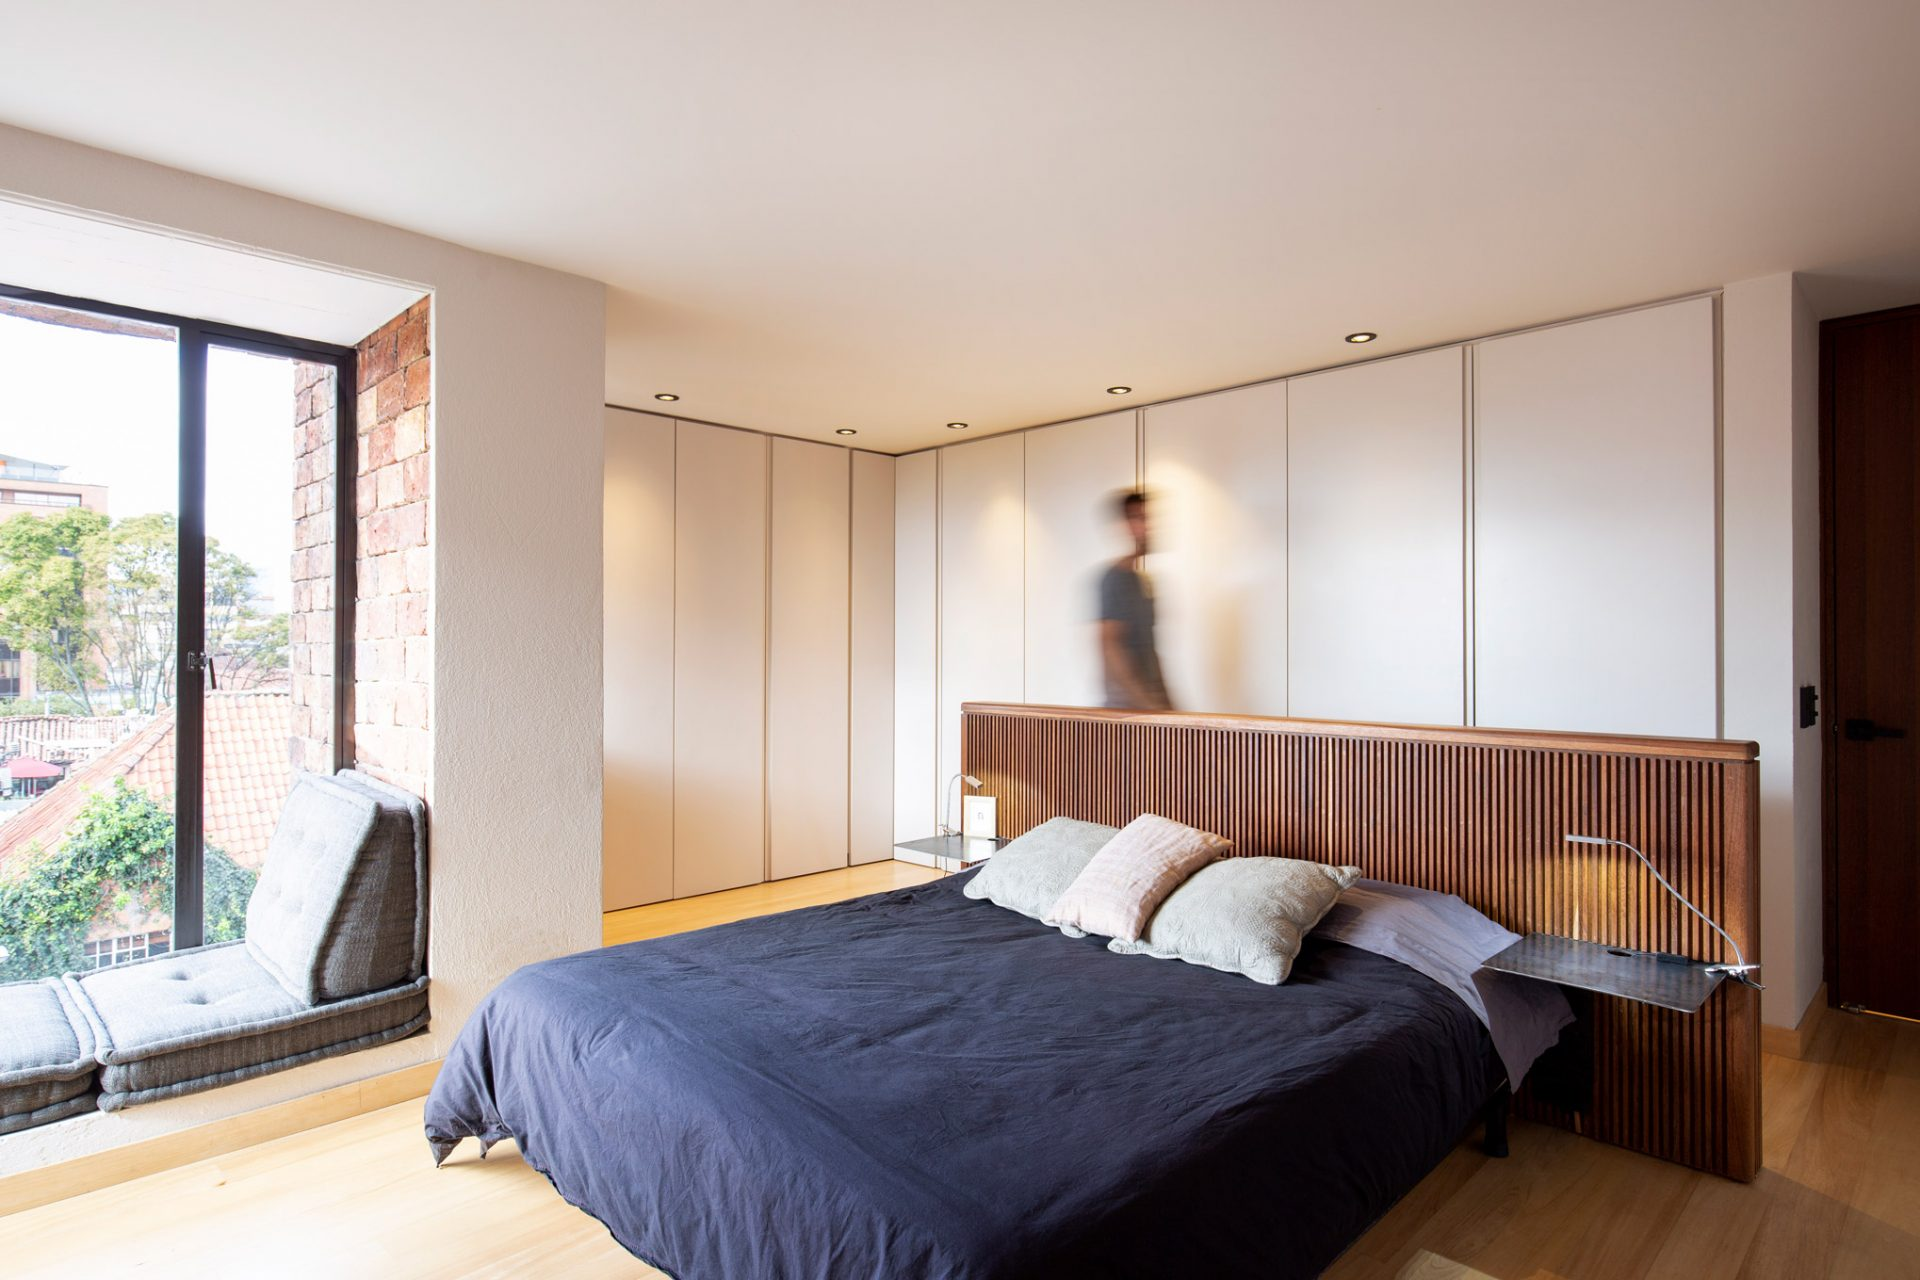 10.MLS_arquitectura_taller_tragaluz_interior_dutch_bogota_colombia_simon_bosch_photography